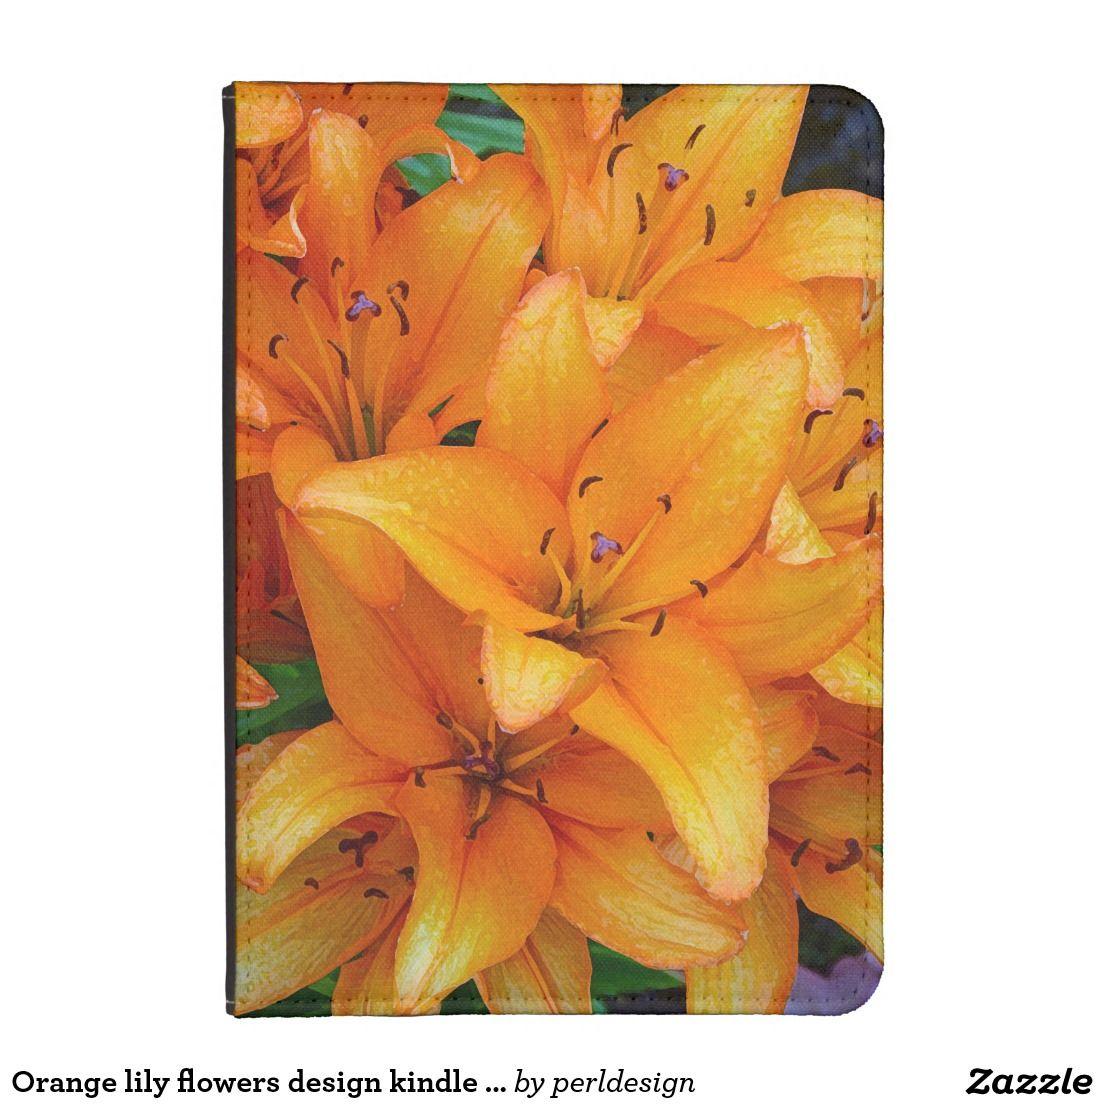 Orange lily flowers design kindle case ipad and other electronic orange lily flowers design kindle case izmirmasajfo